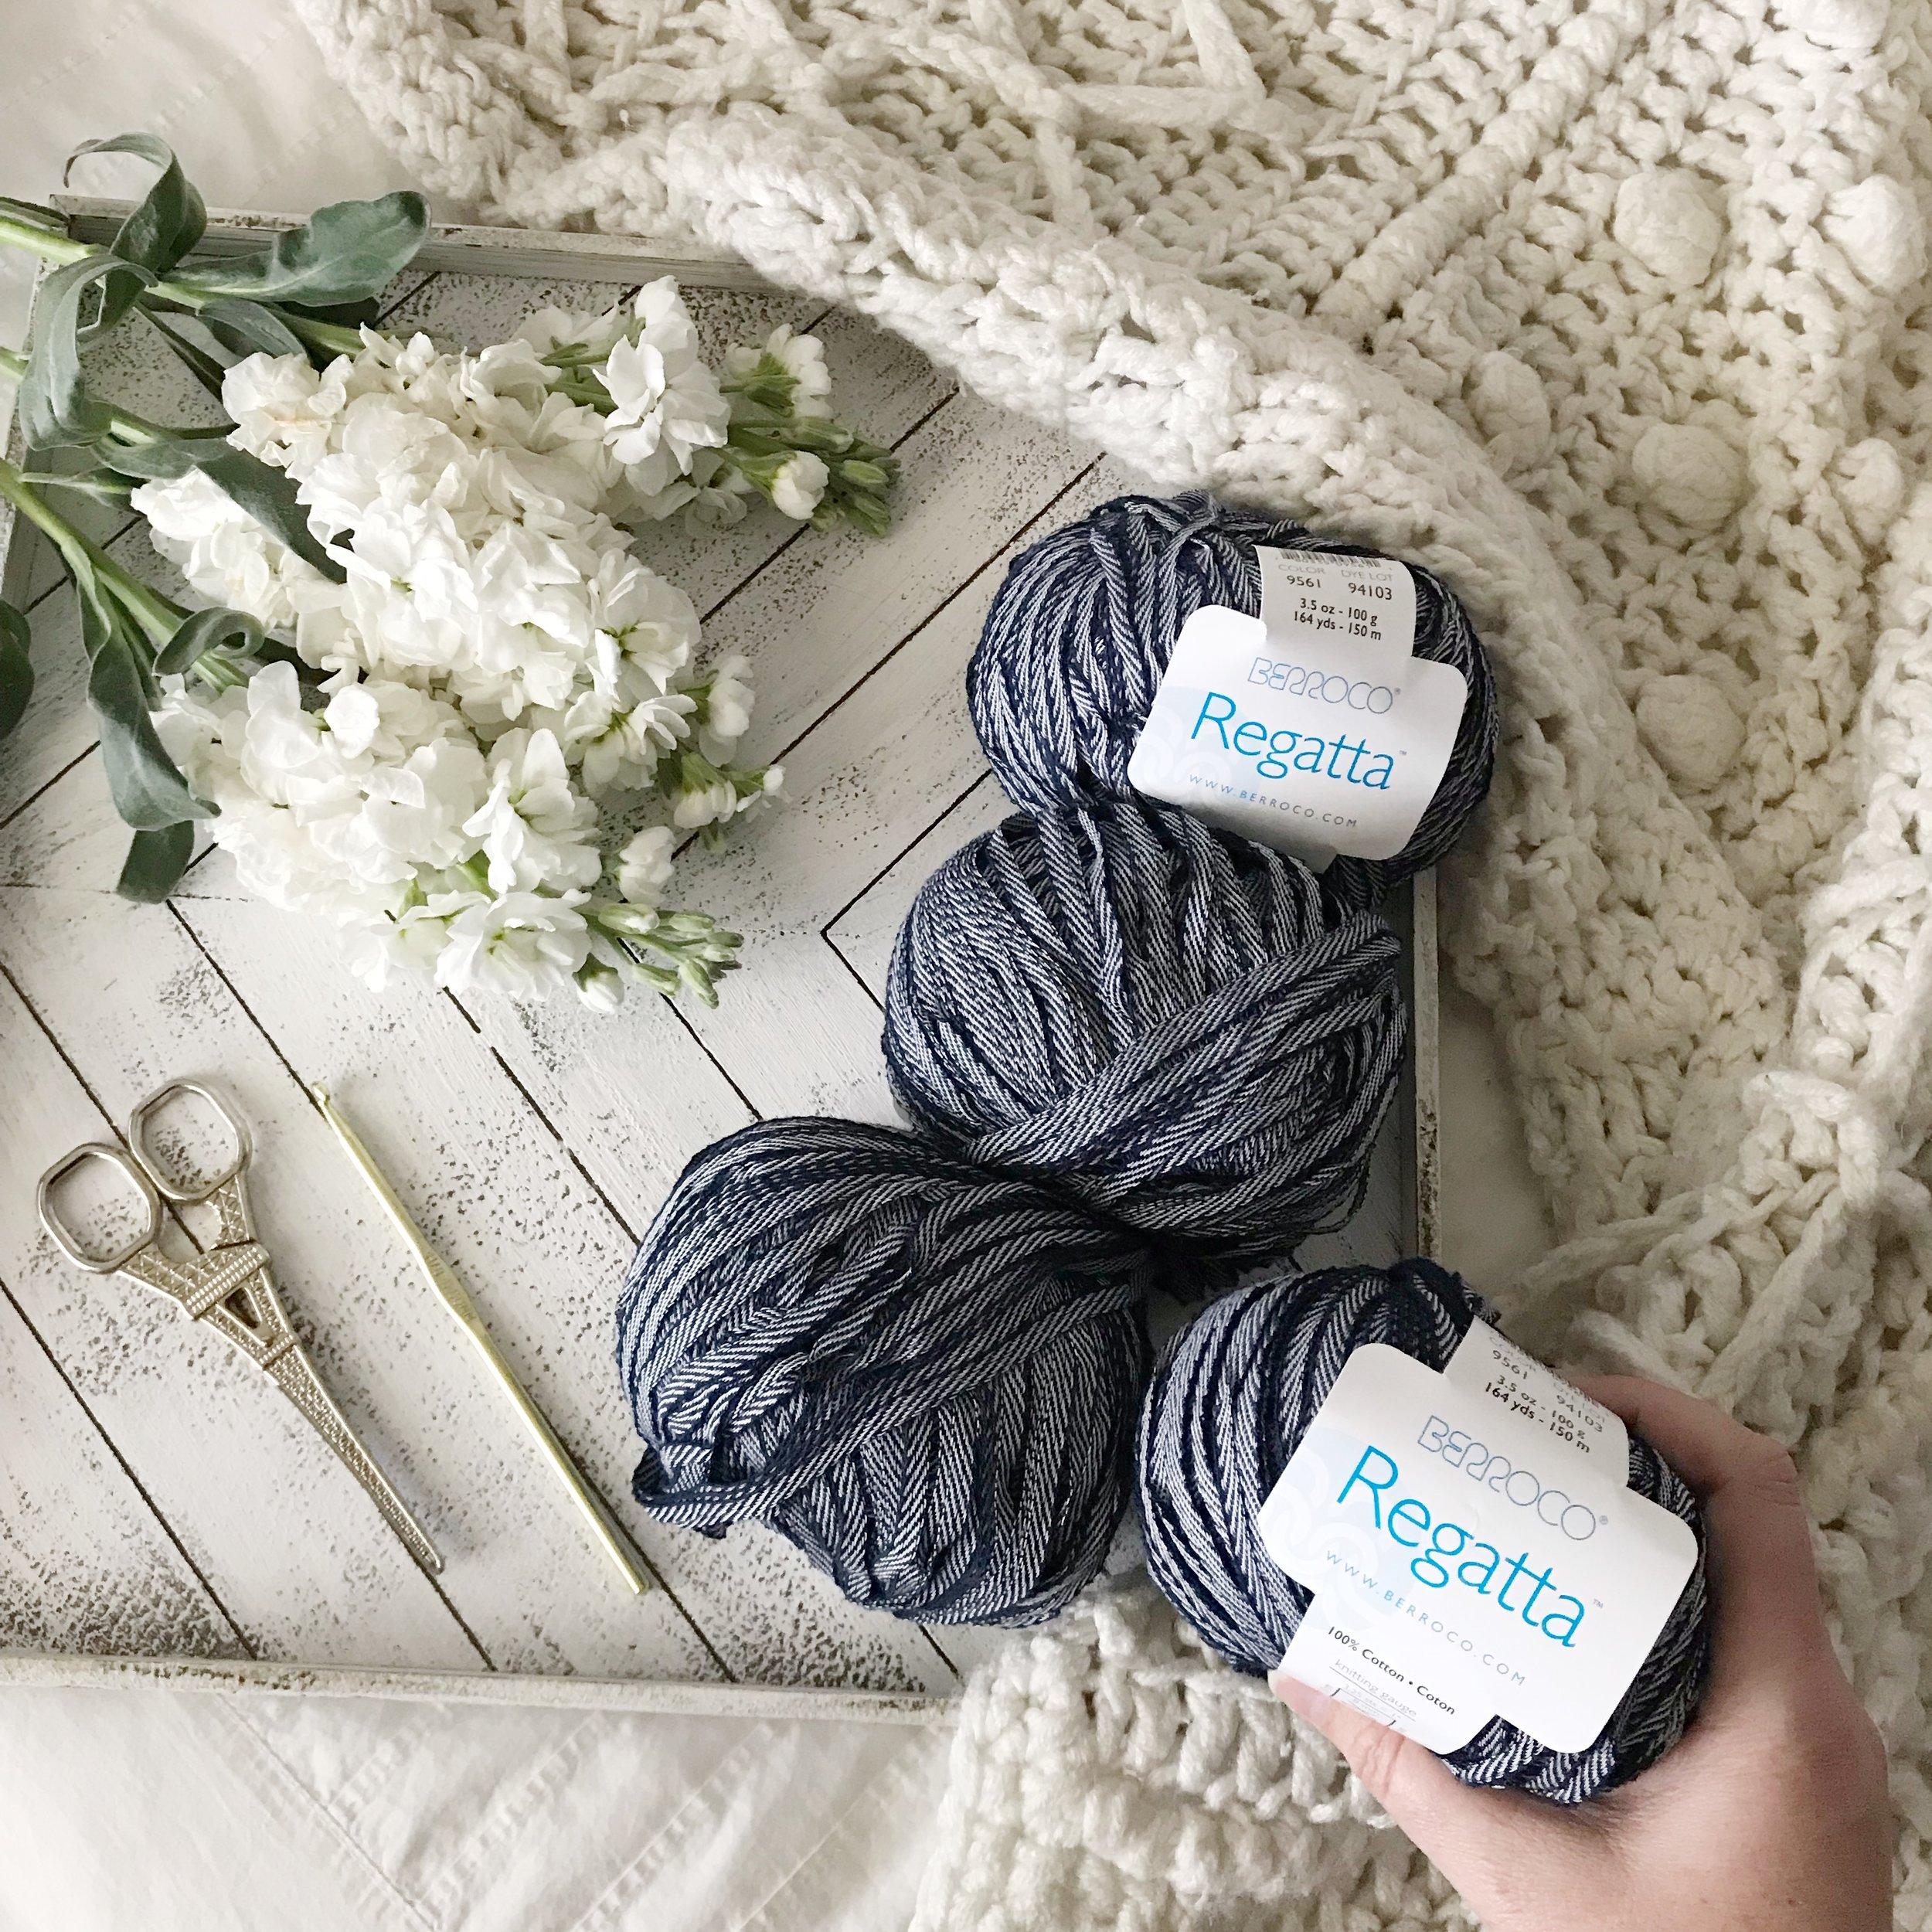 berroco regatta tape yarn